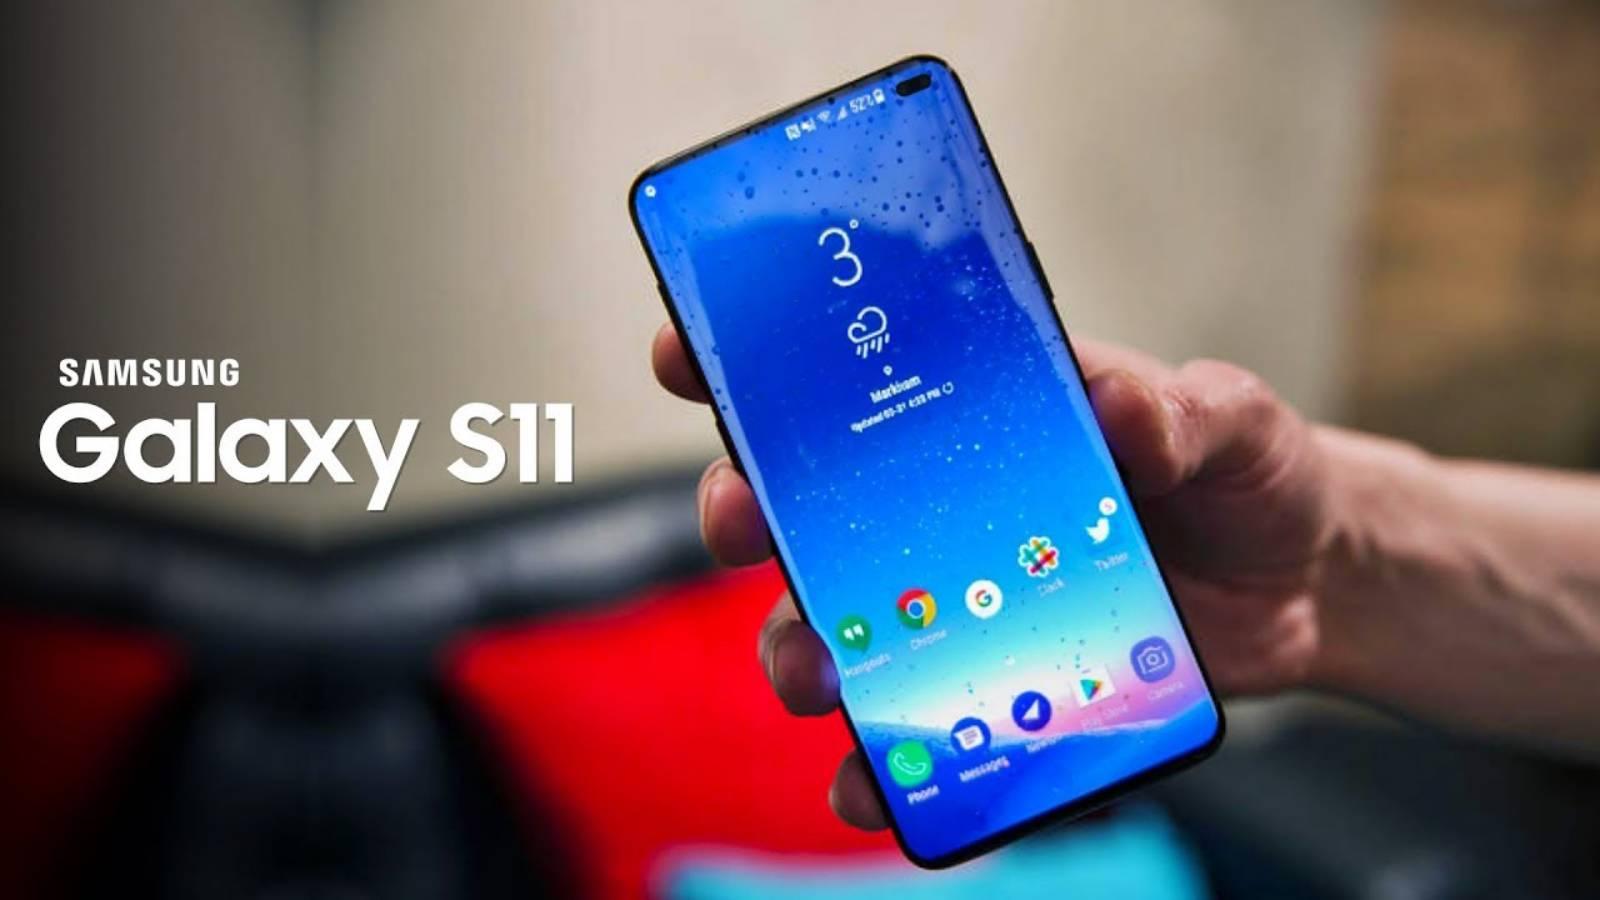 Samsung GALAXY S11 huawei